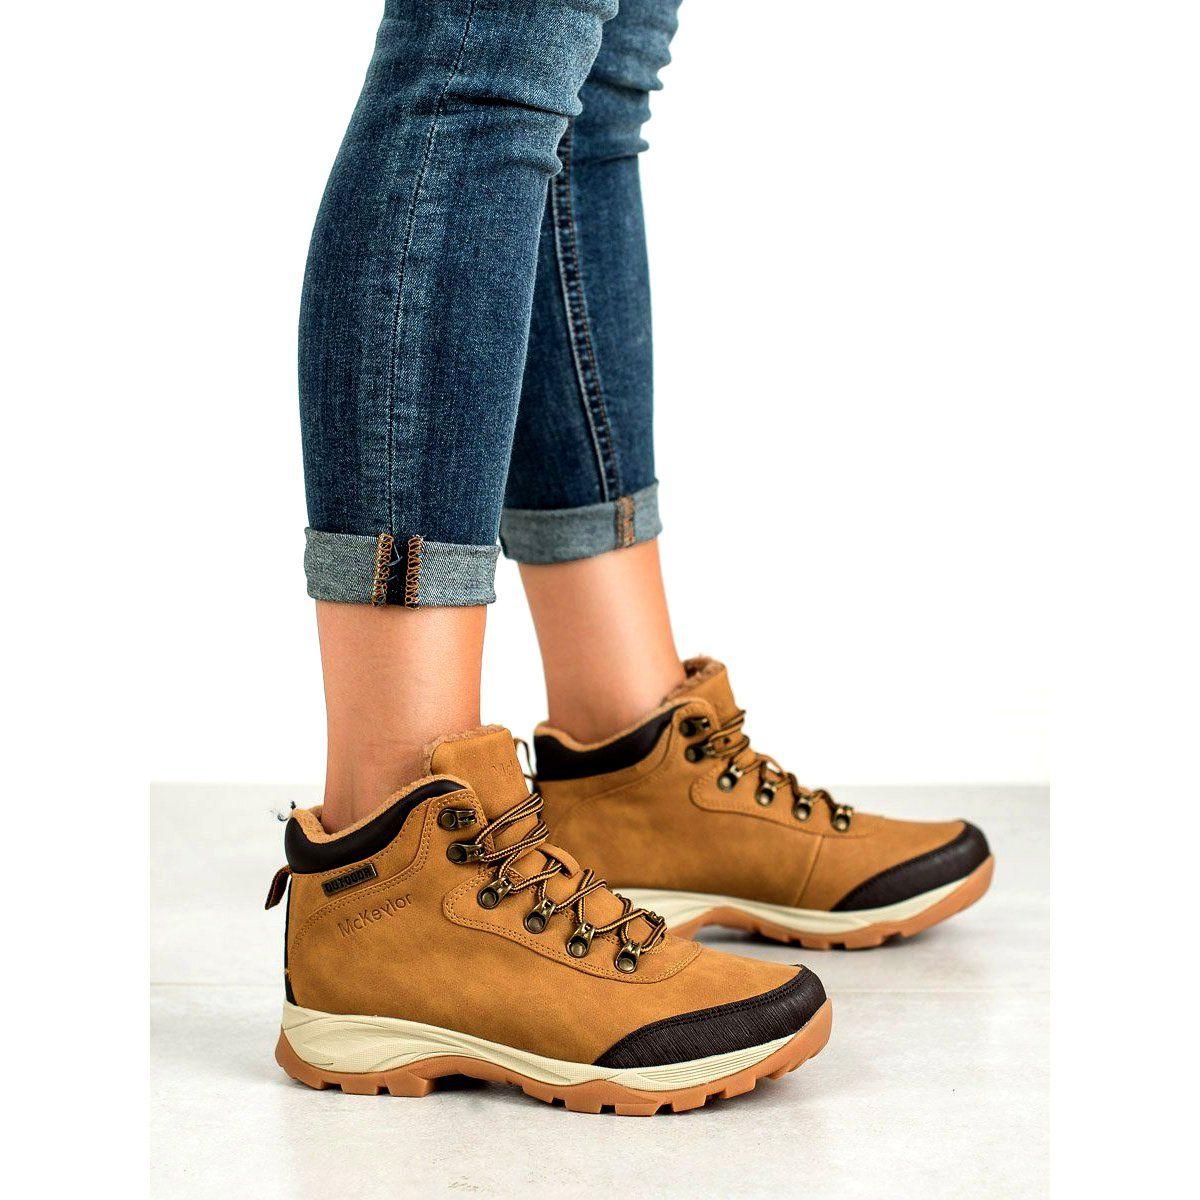 Buty Trekkingowe Mckeylor Brazowe Shoes Women Shoes Trekking Shoes